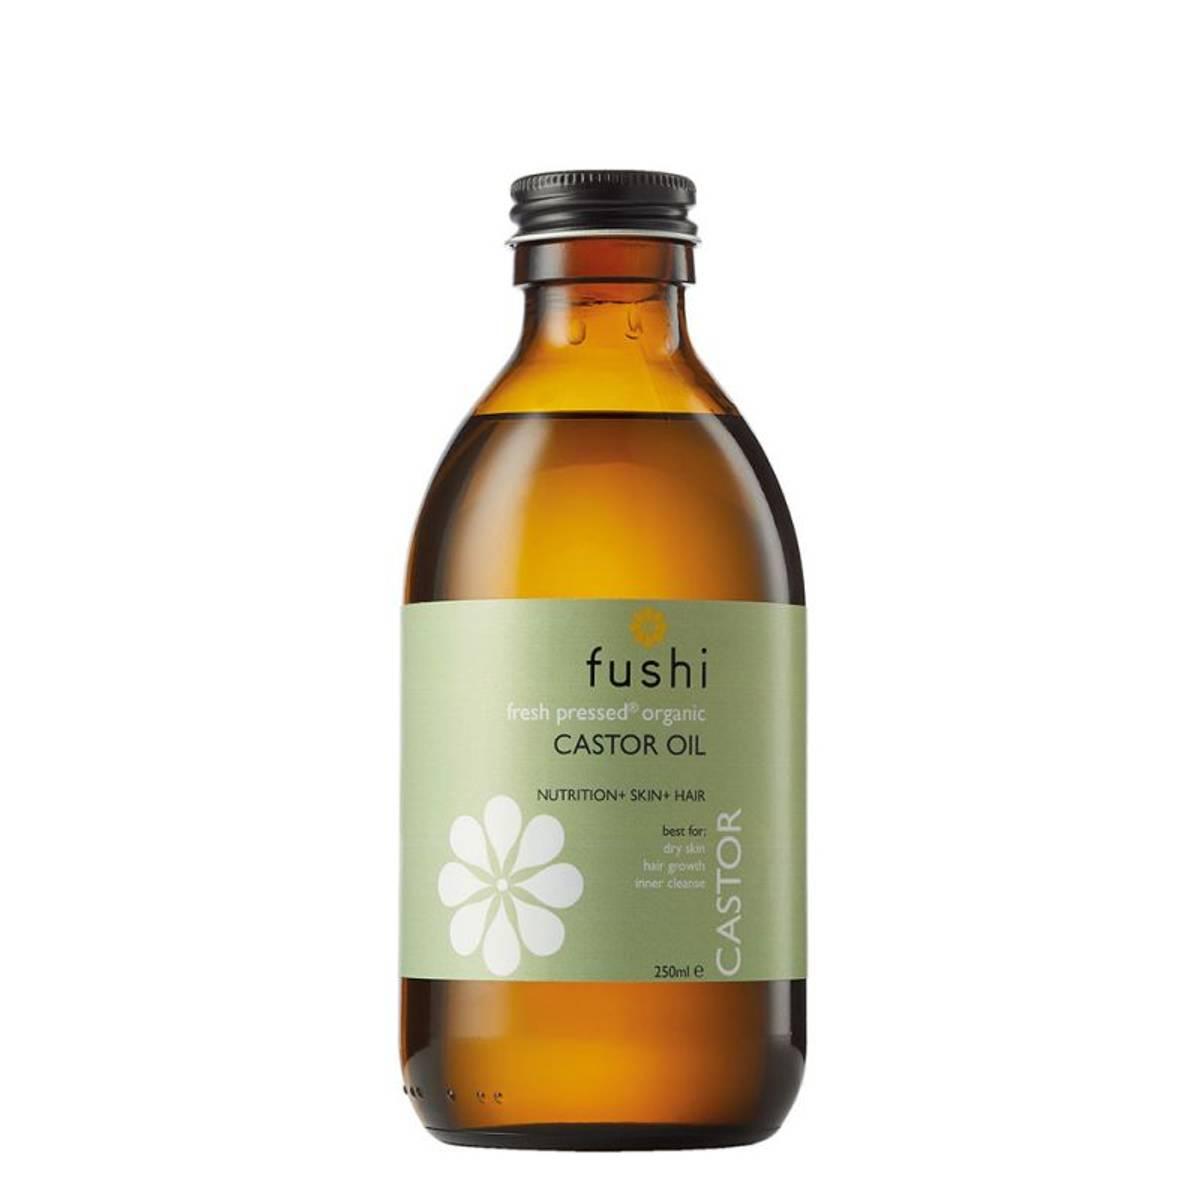 Castor olje, ferskpresset og økologisk, 250 ml / Fushi